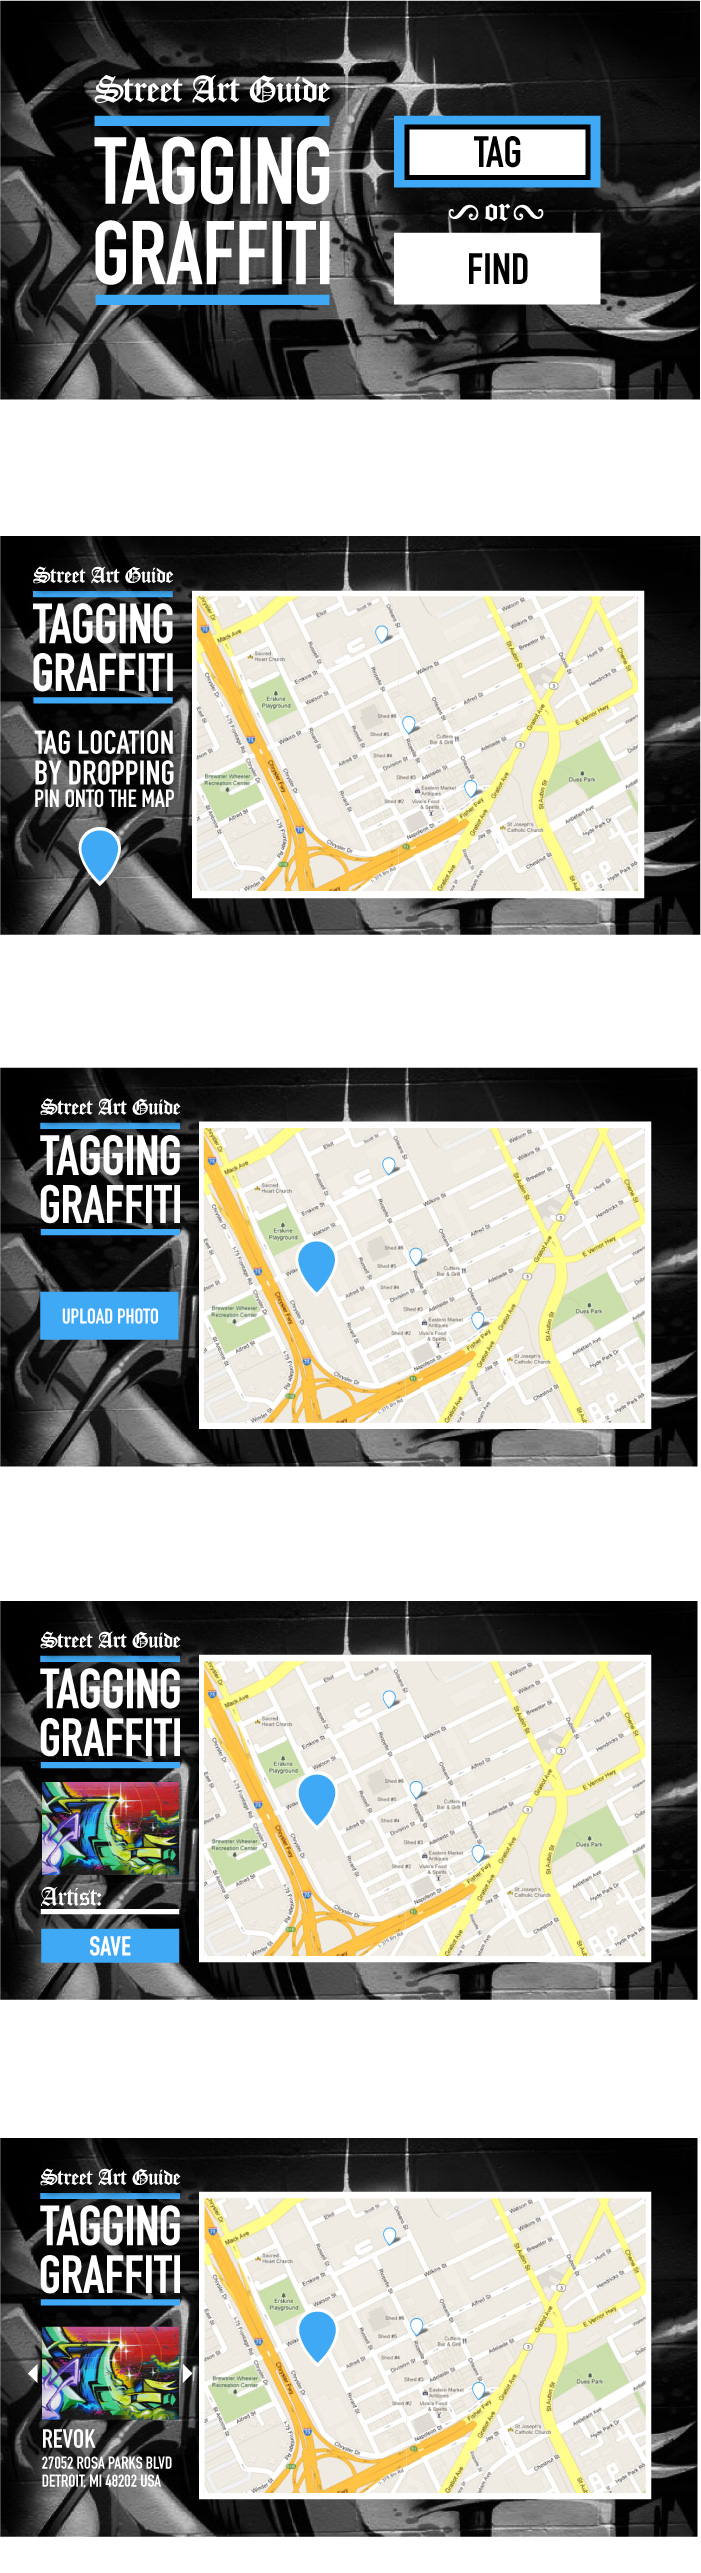 Tagging Graffiti  - image 2 - student project